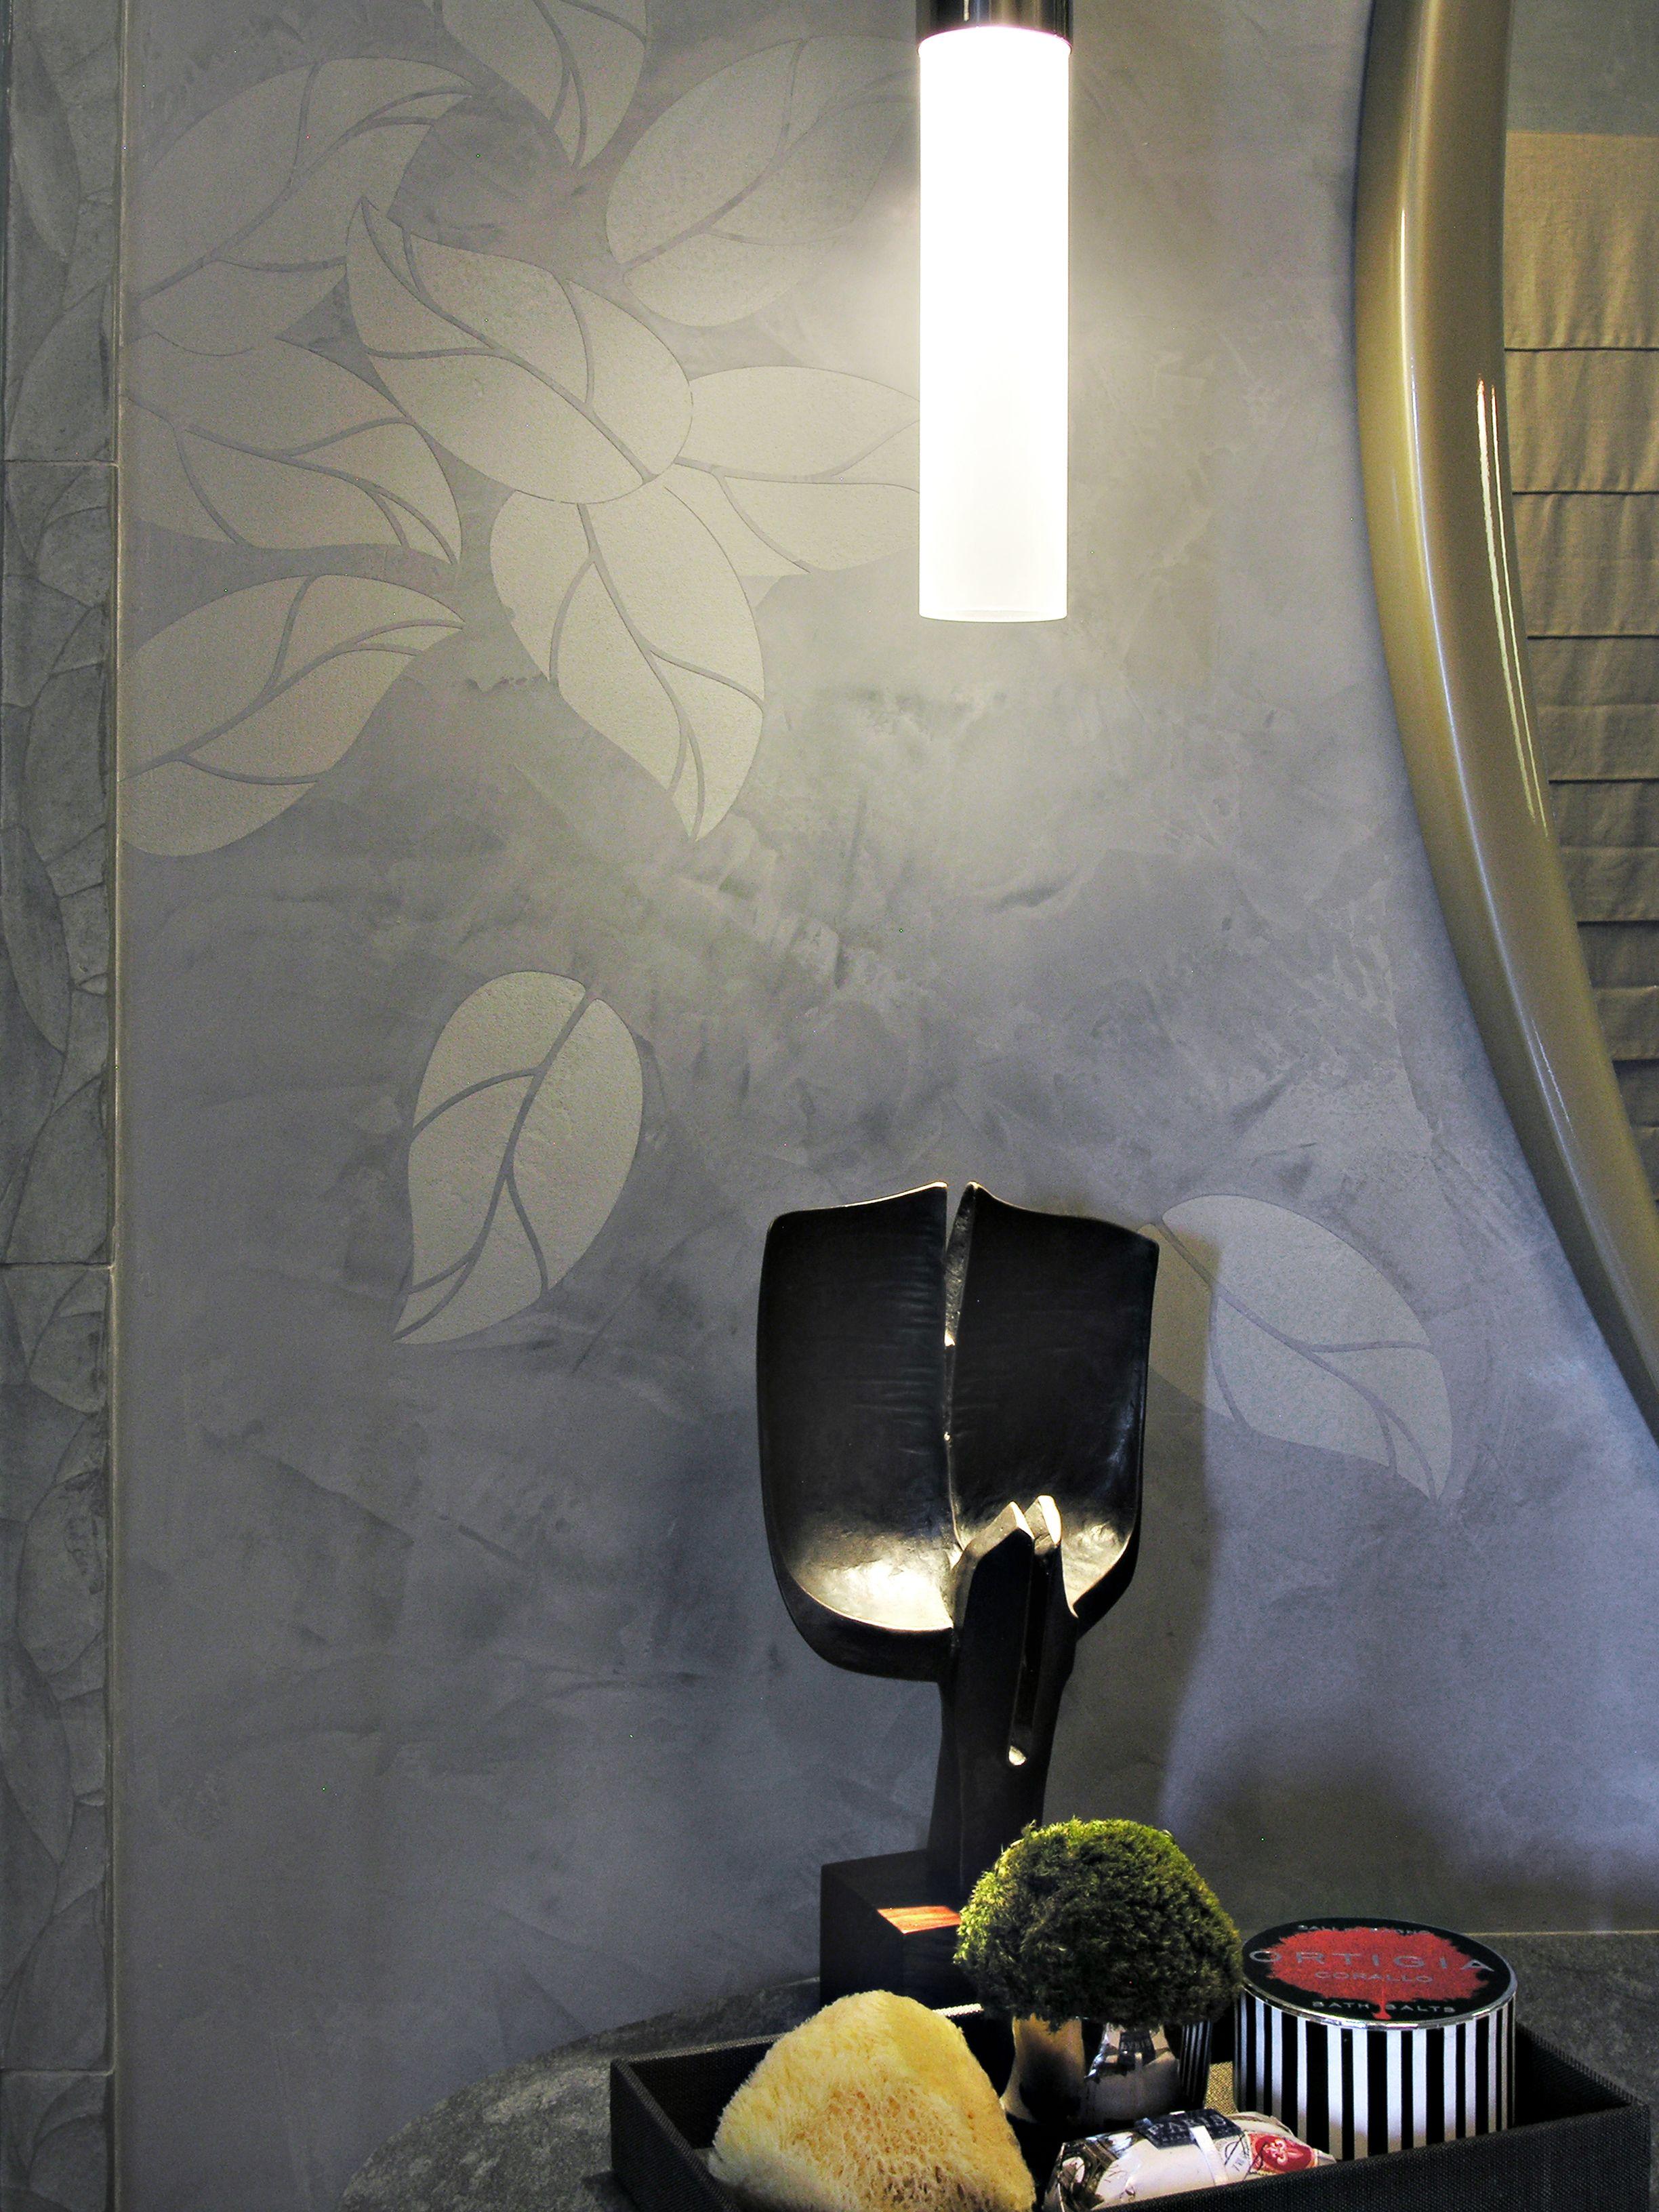 Pin By Venetian Plaster Art On Venetian Plaster On The: Stenciled Venetian Plaster Walls By Willem Racké In Mark